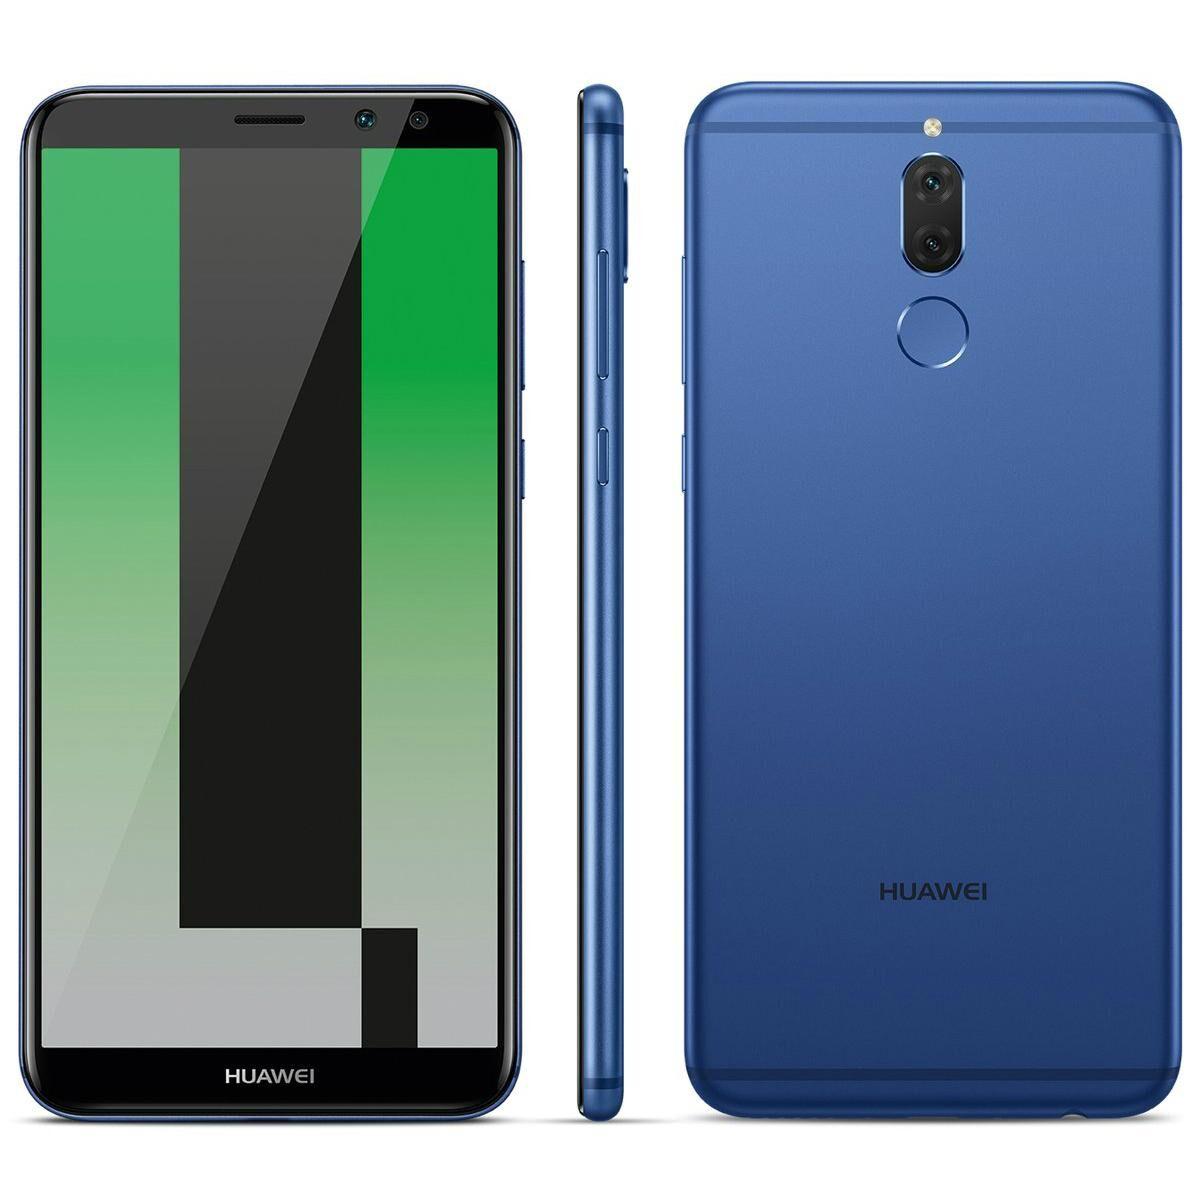 HUAWEI Mate 10 Lite - 64 Go - Bleu - Smartphone Dual SIM